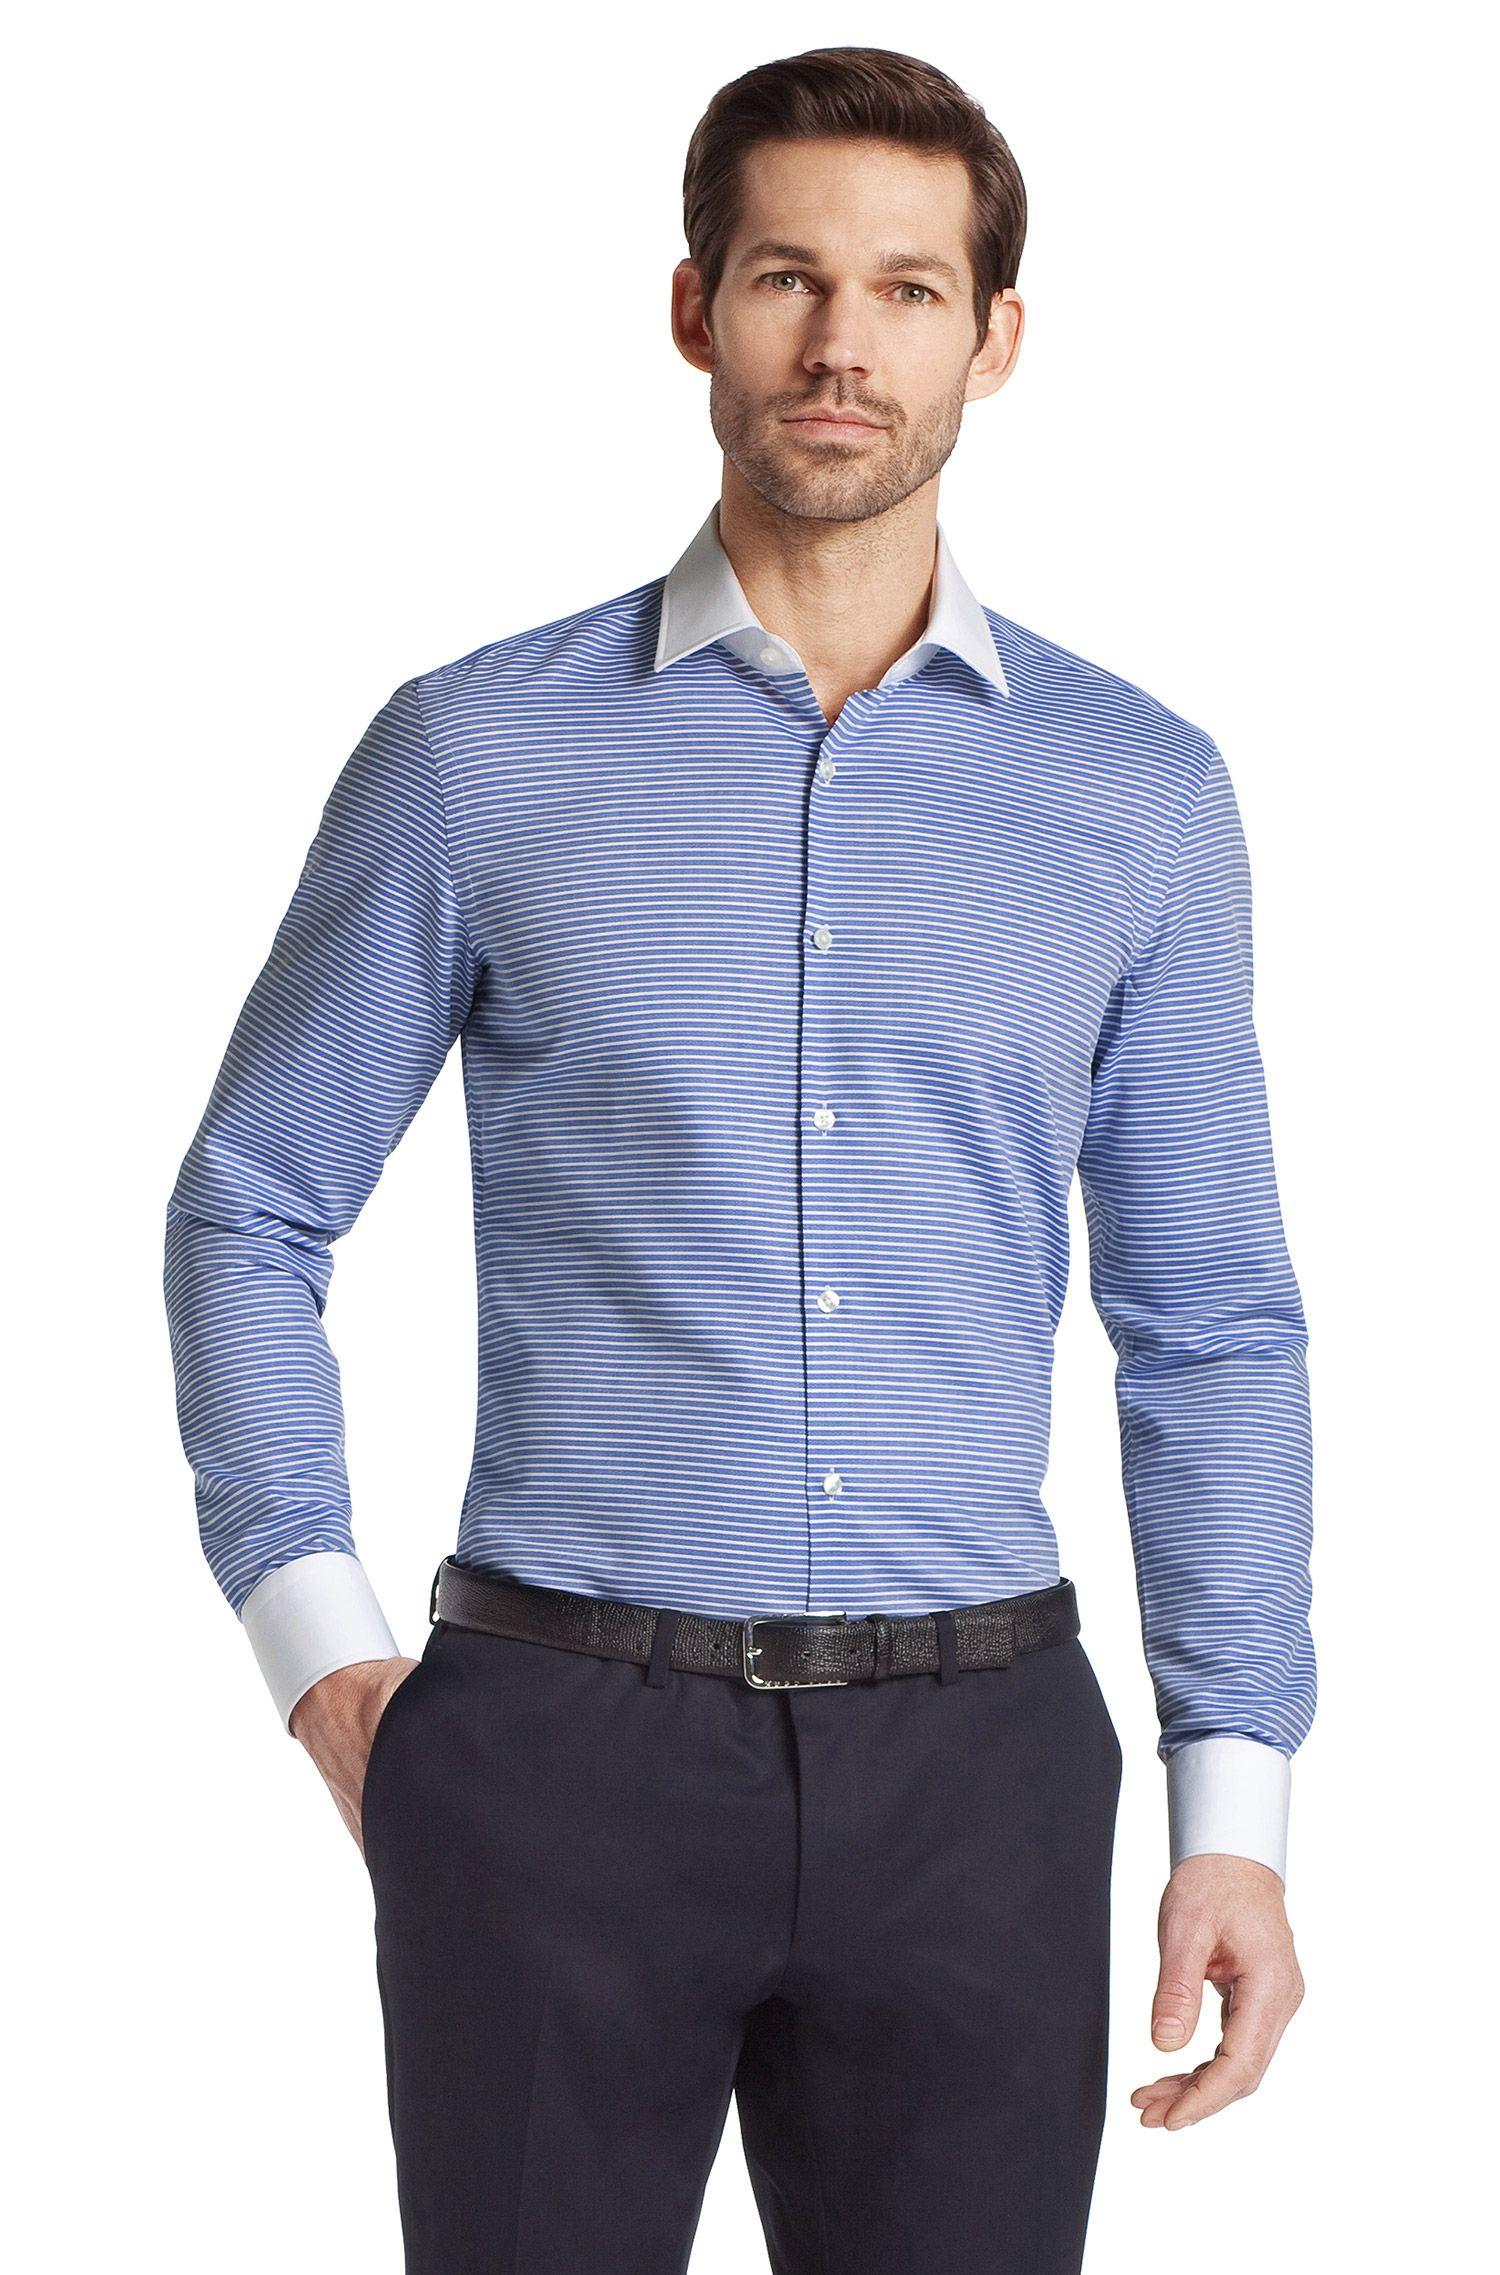 Business-overhemd ´JONNE` met winchesterkraag